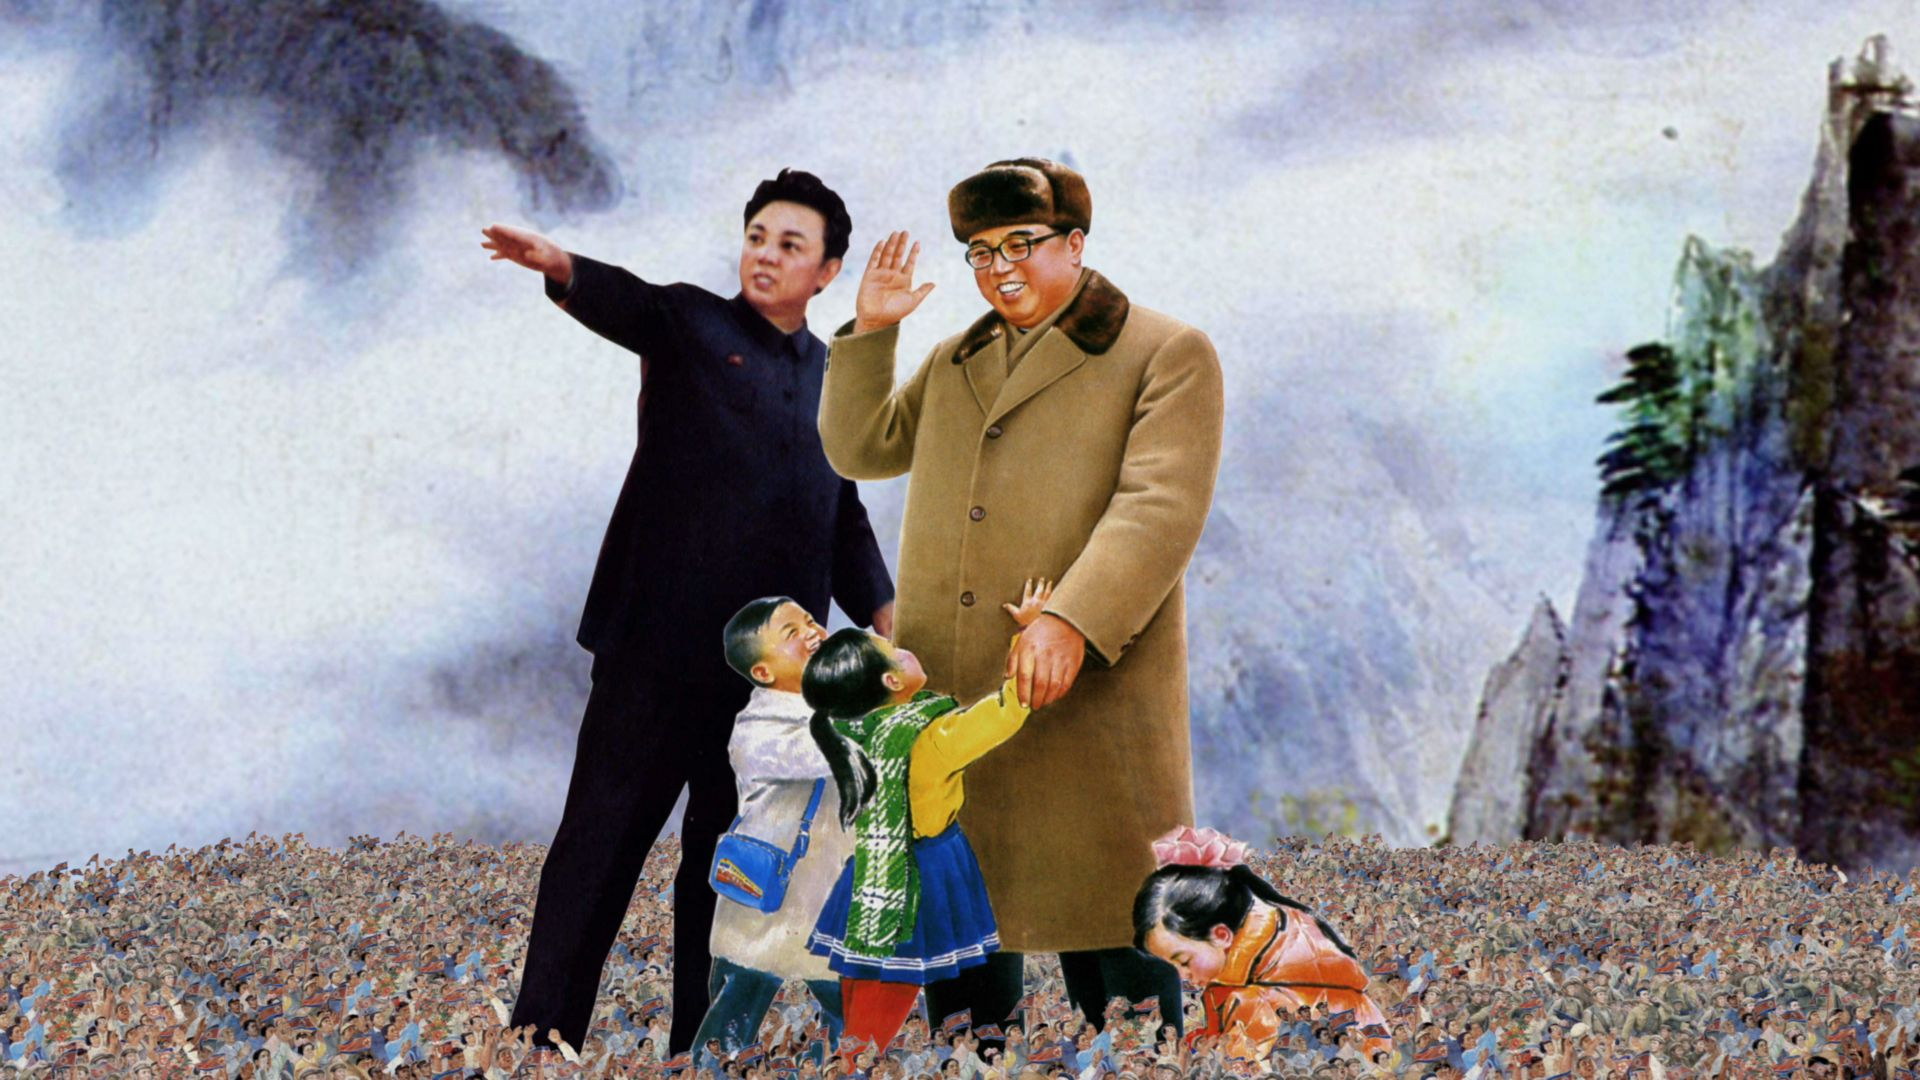 Poster Kim Il Sung dan Kim Jong Il | Canoe.com